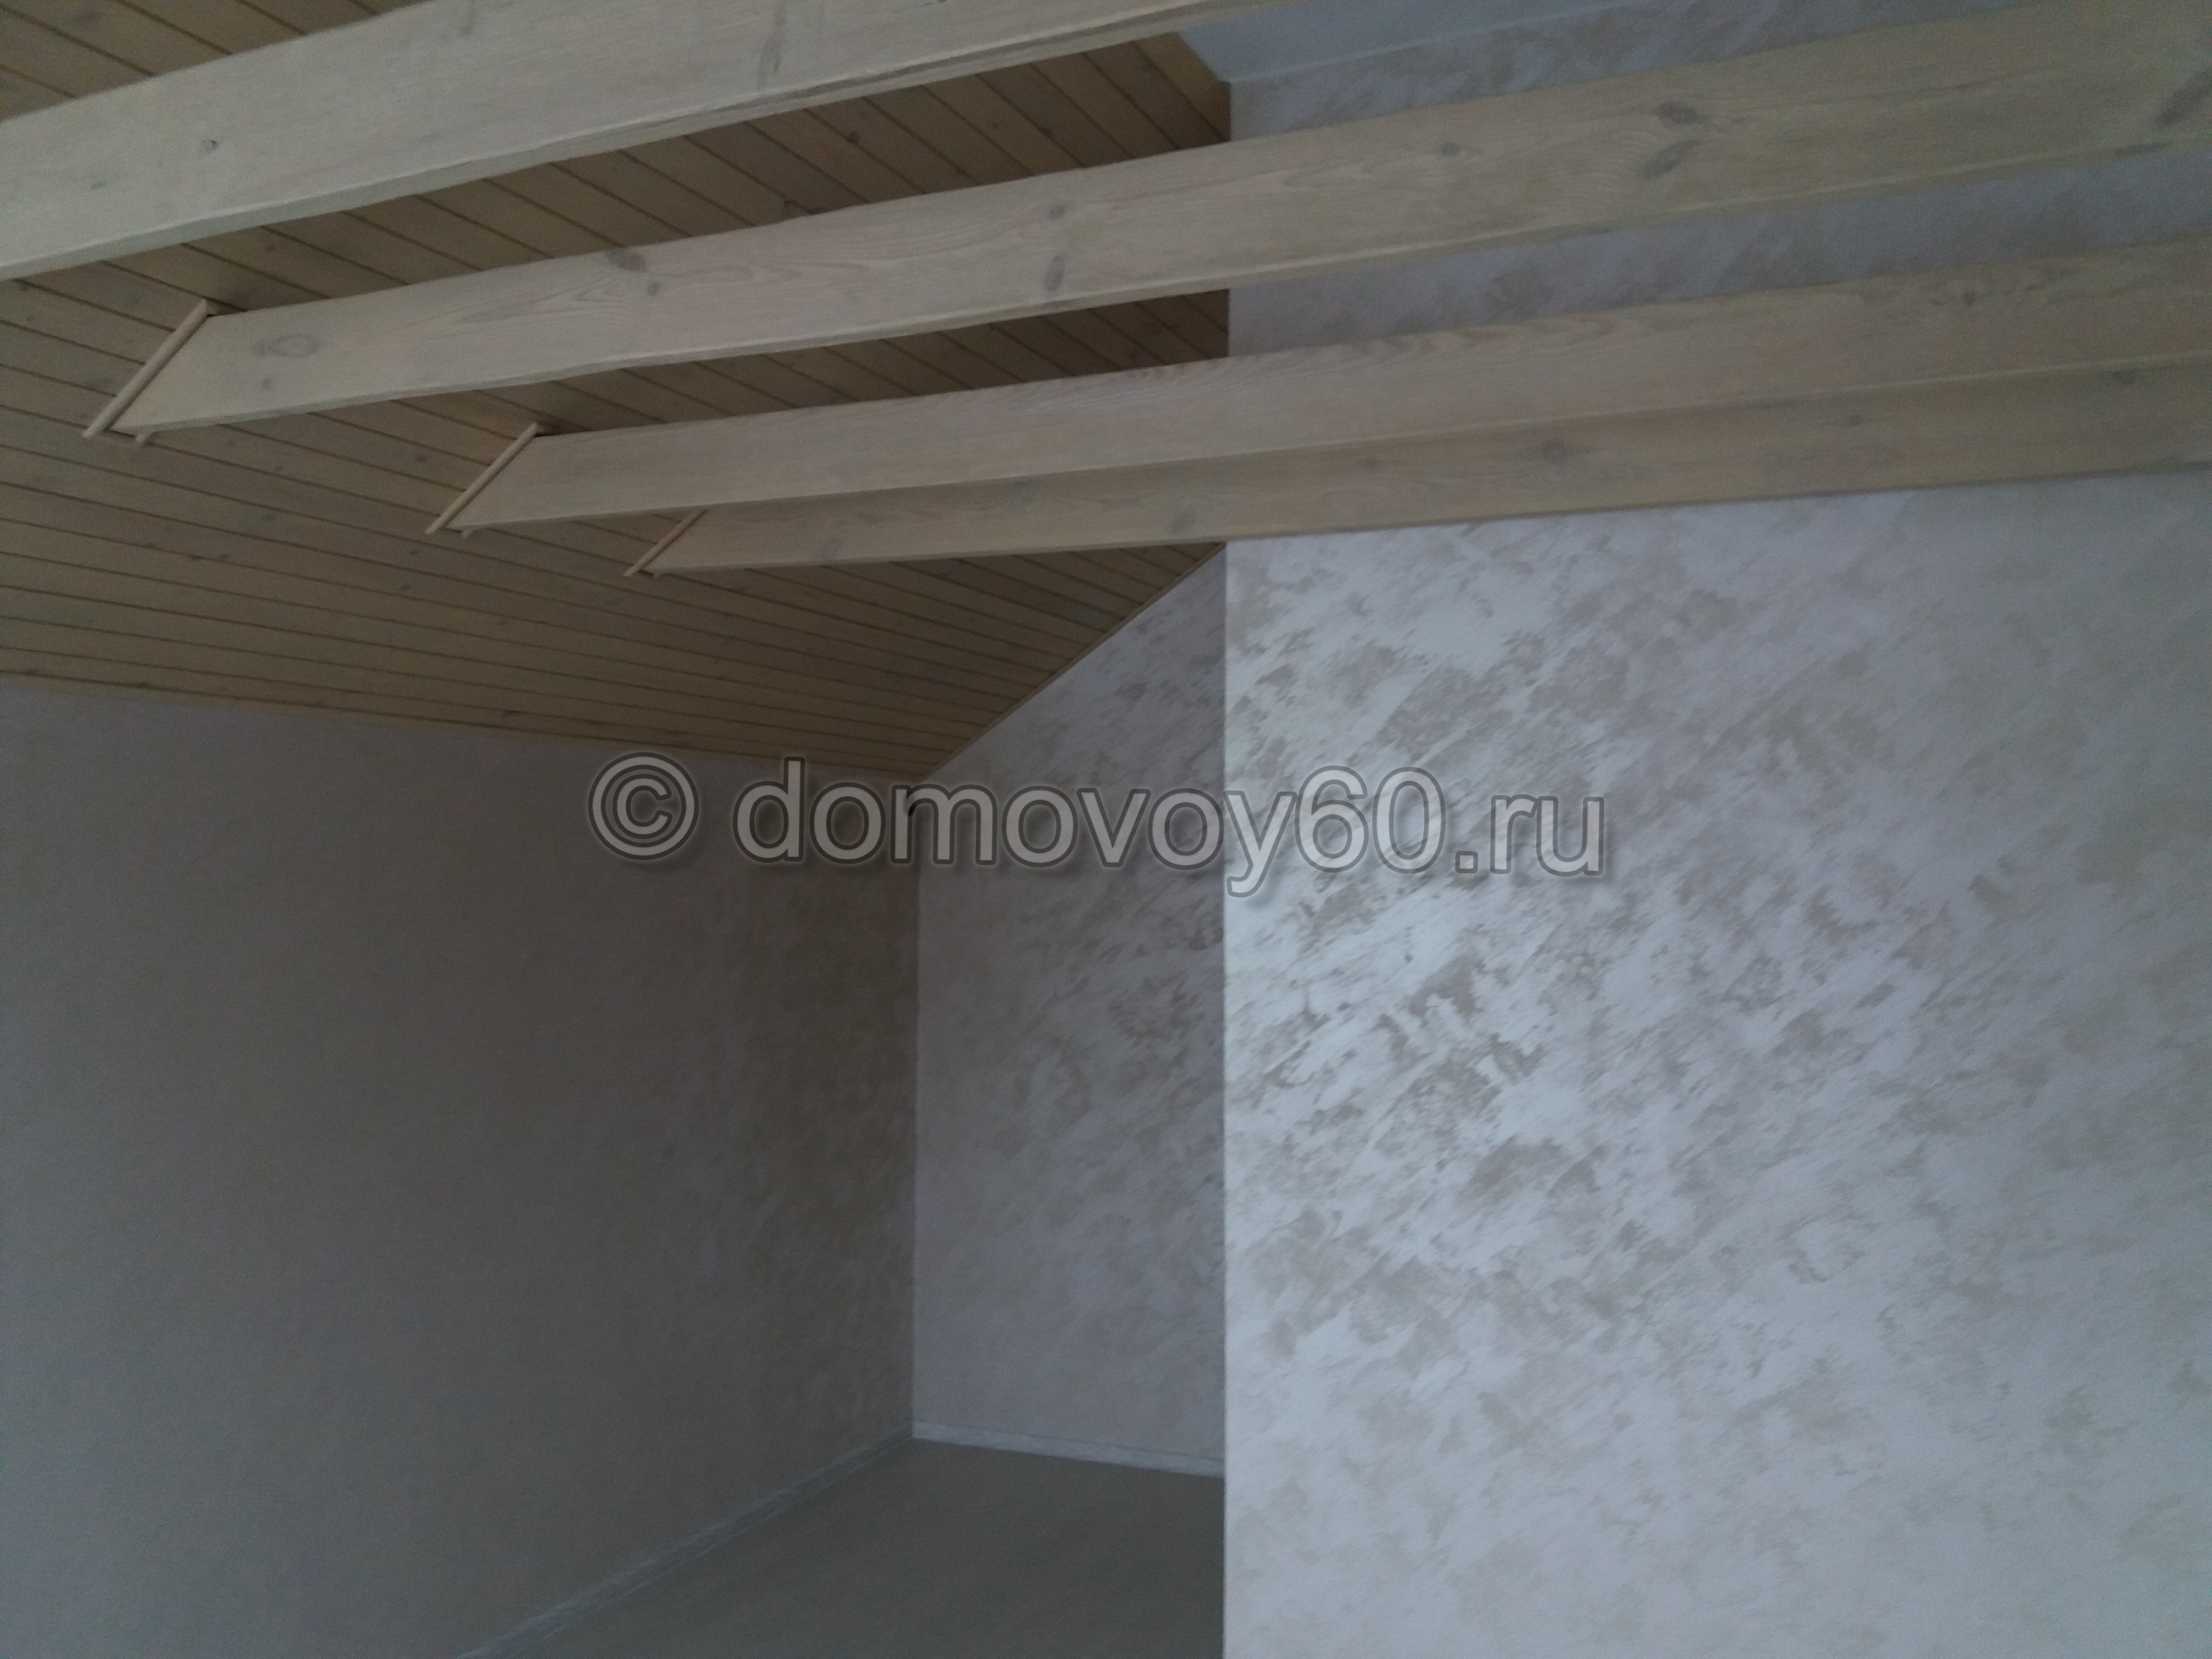 domovoy60-044